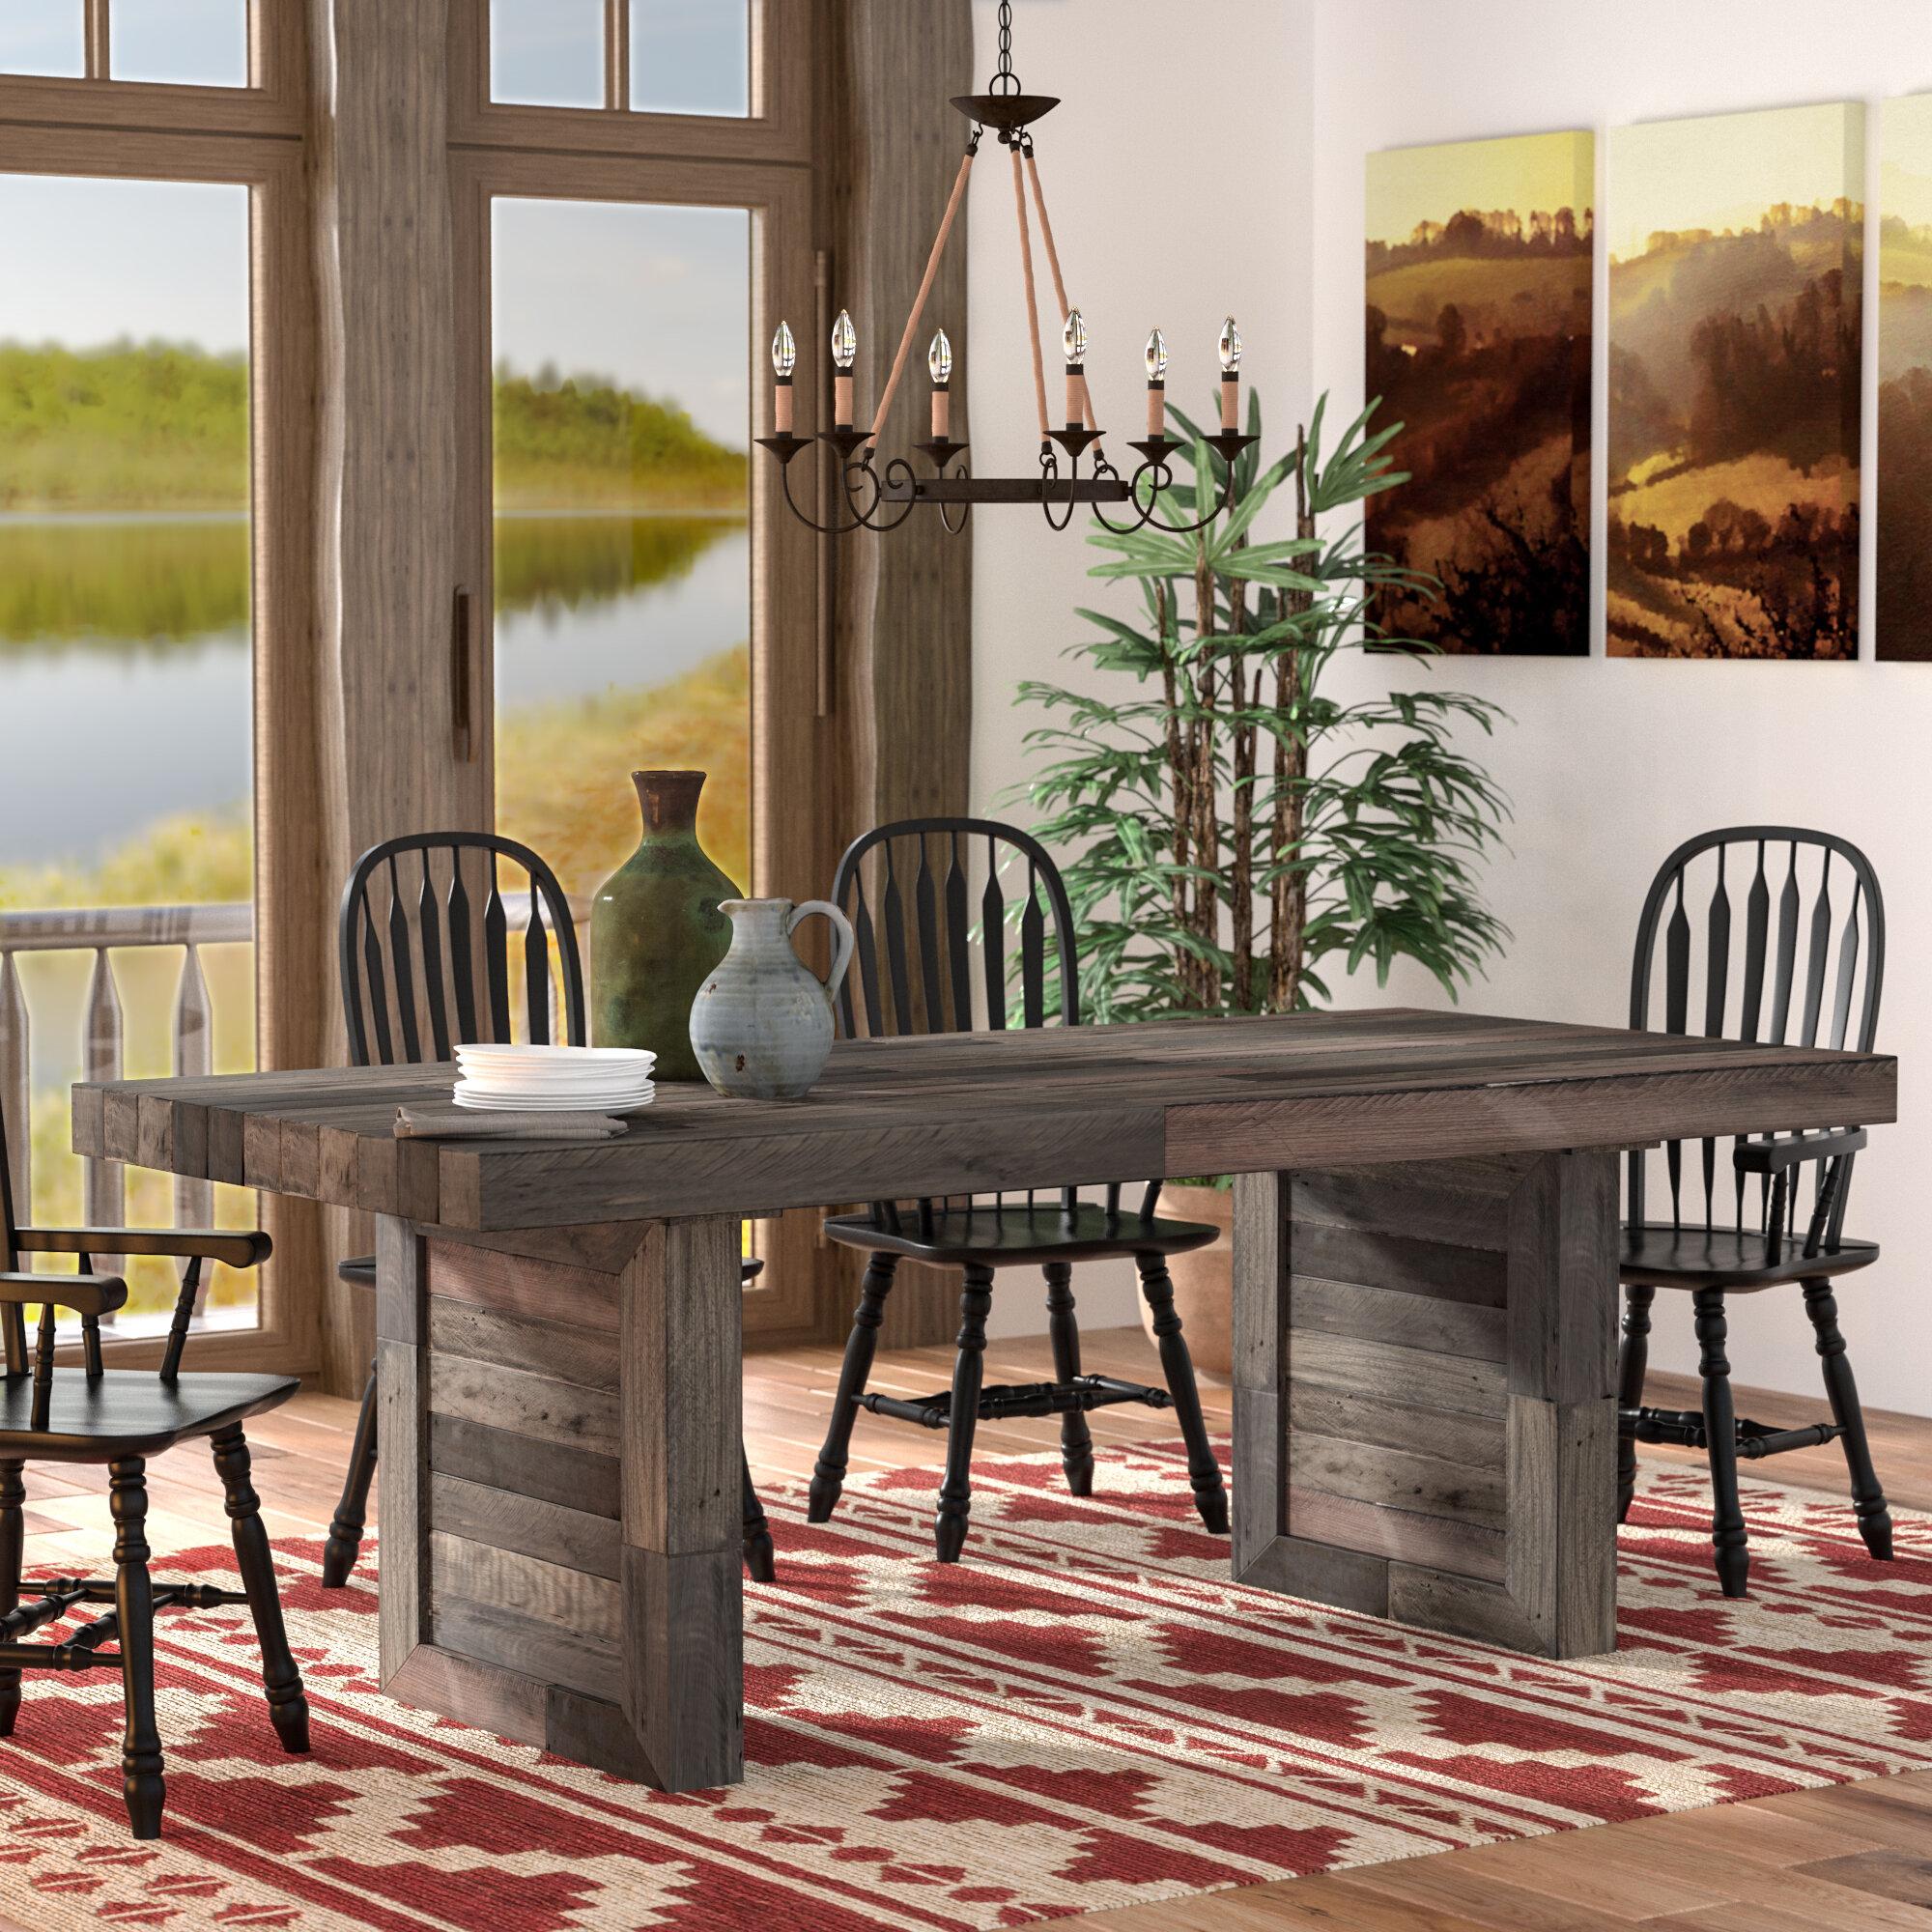 Rustic & Farmhouse Tables You ll Love